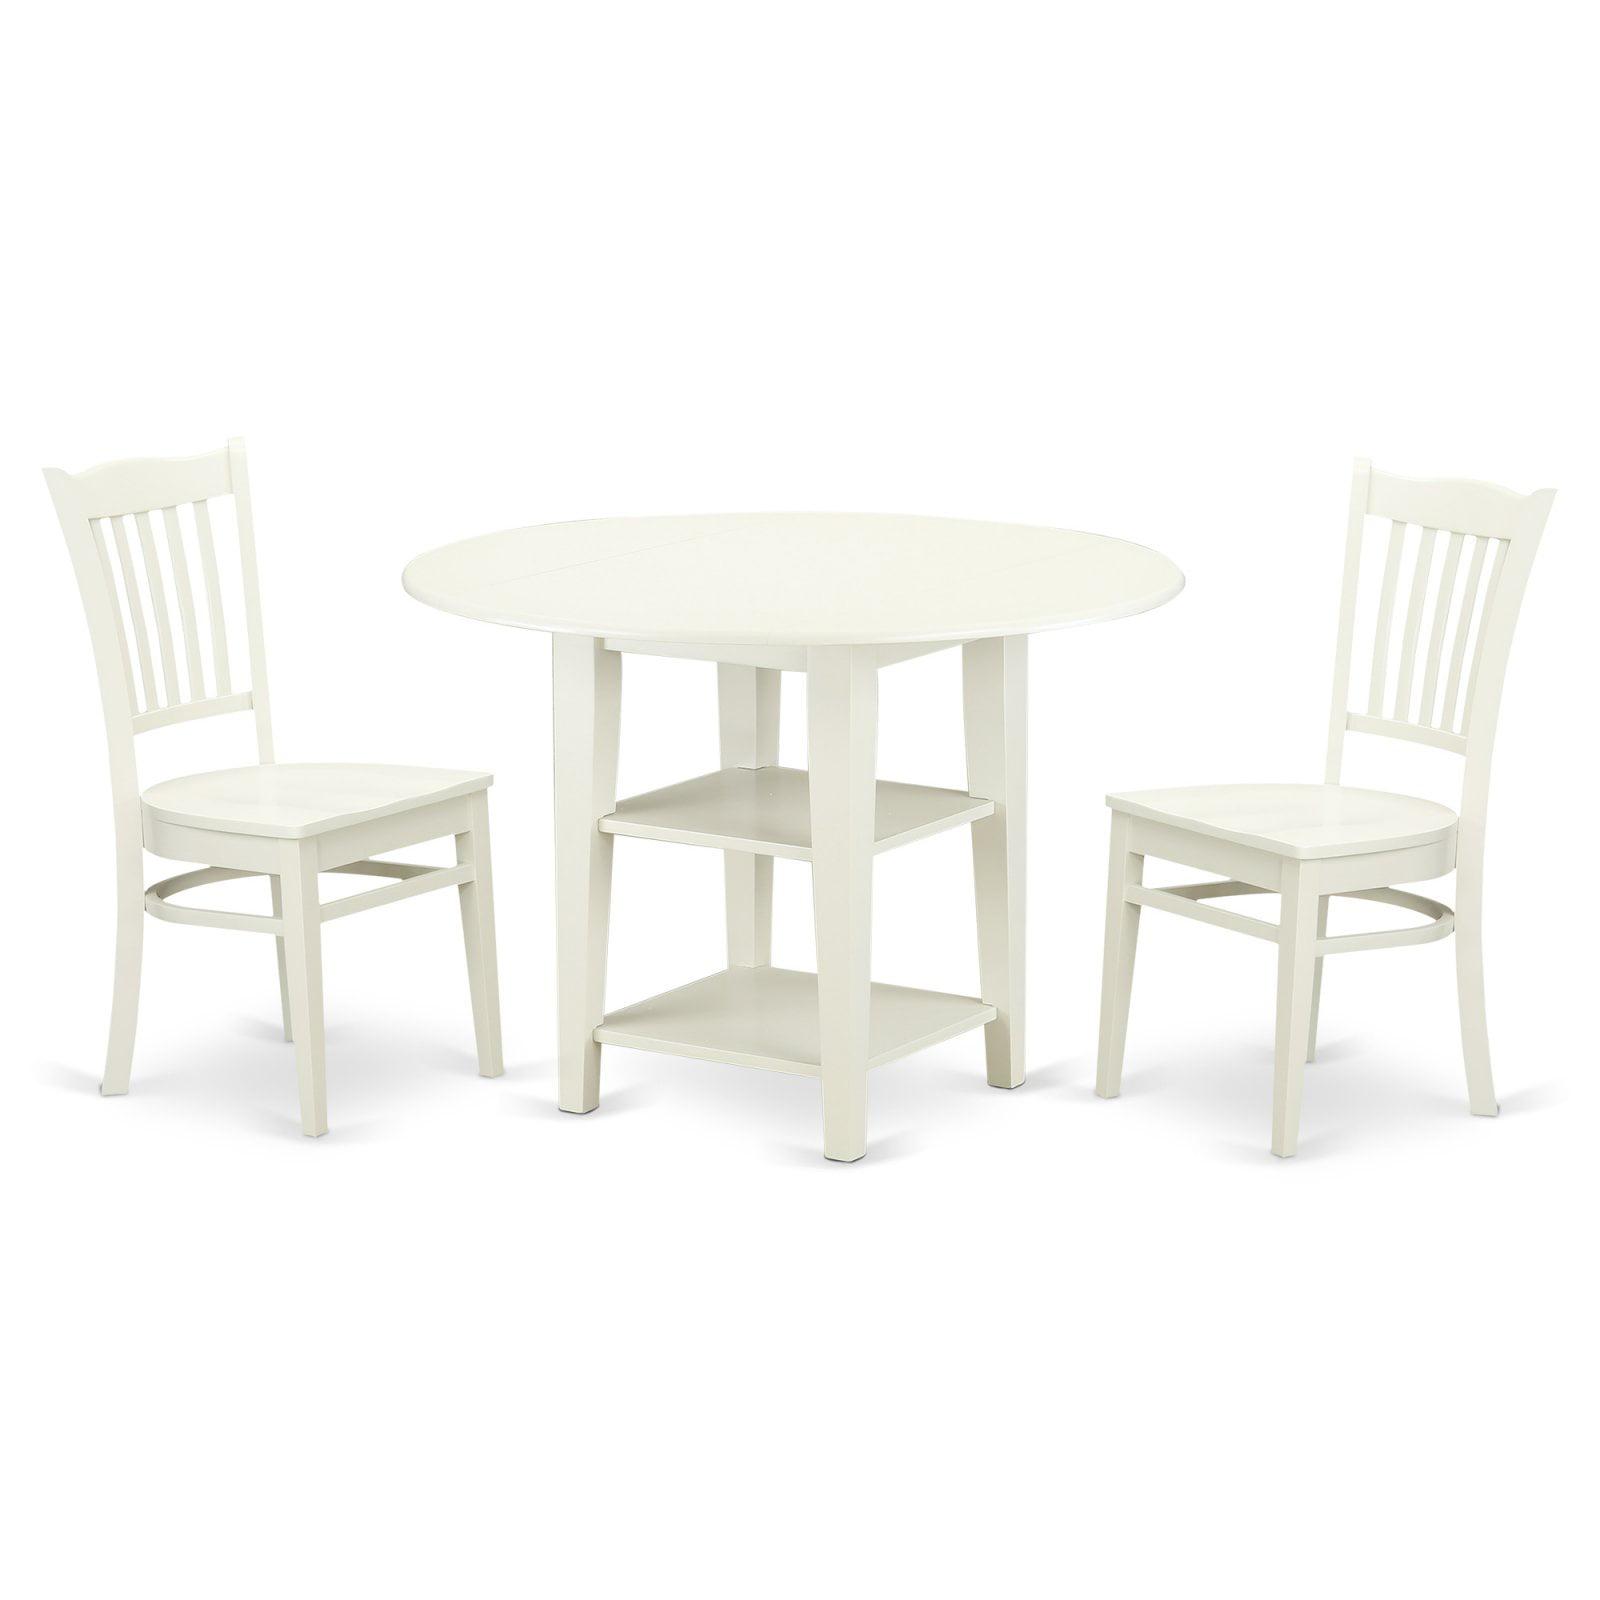 East West Furniture Sudbury 3 Piece Dual Drop Leaf Dining Table Set